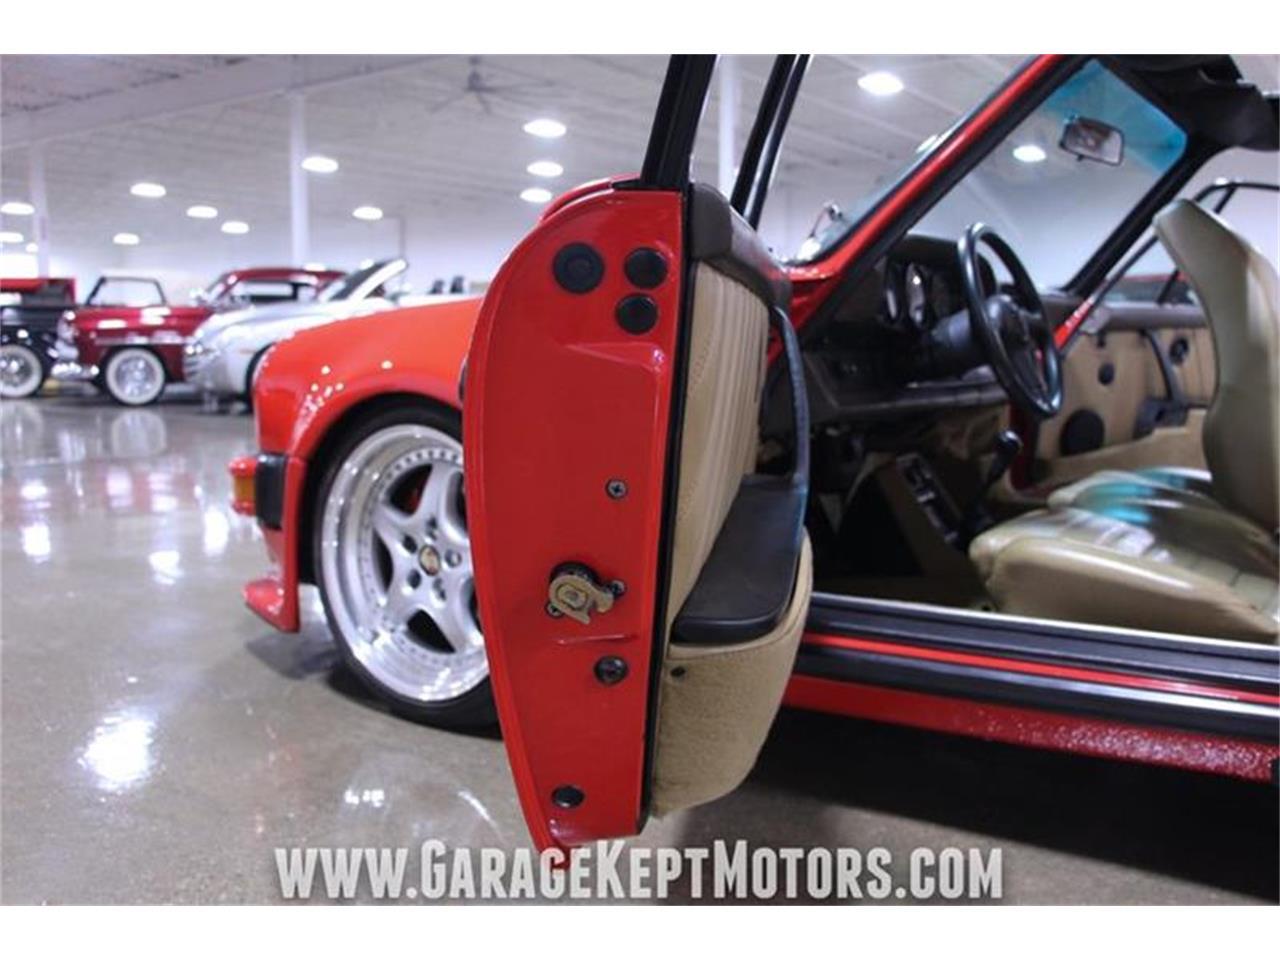 Large Picture of '82 Porsche 911 located in Michigan - $109,900.00 - Q470